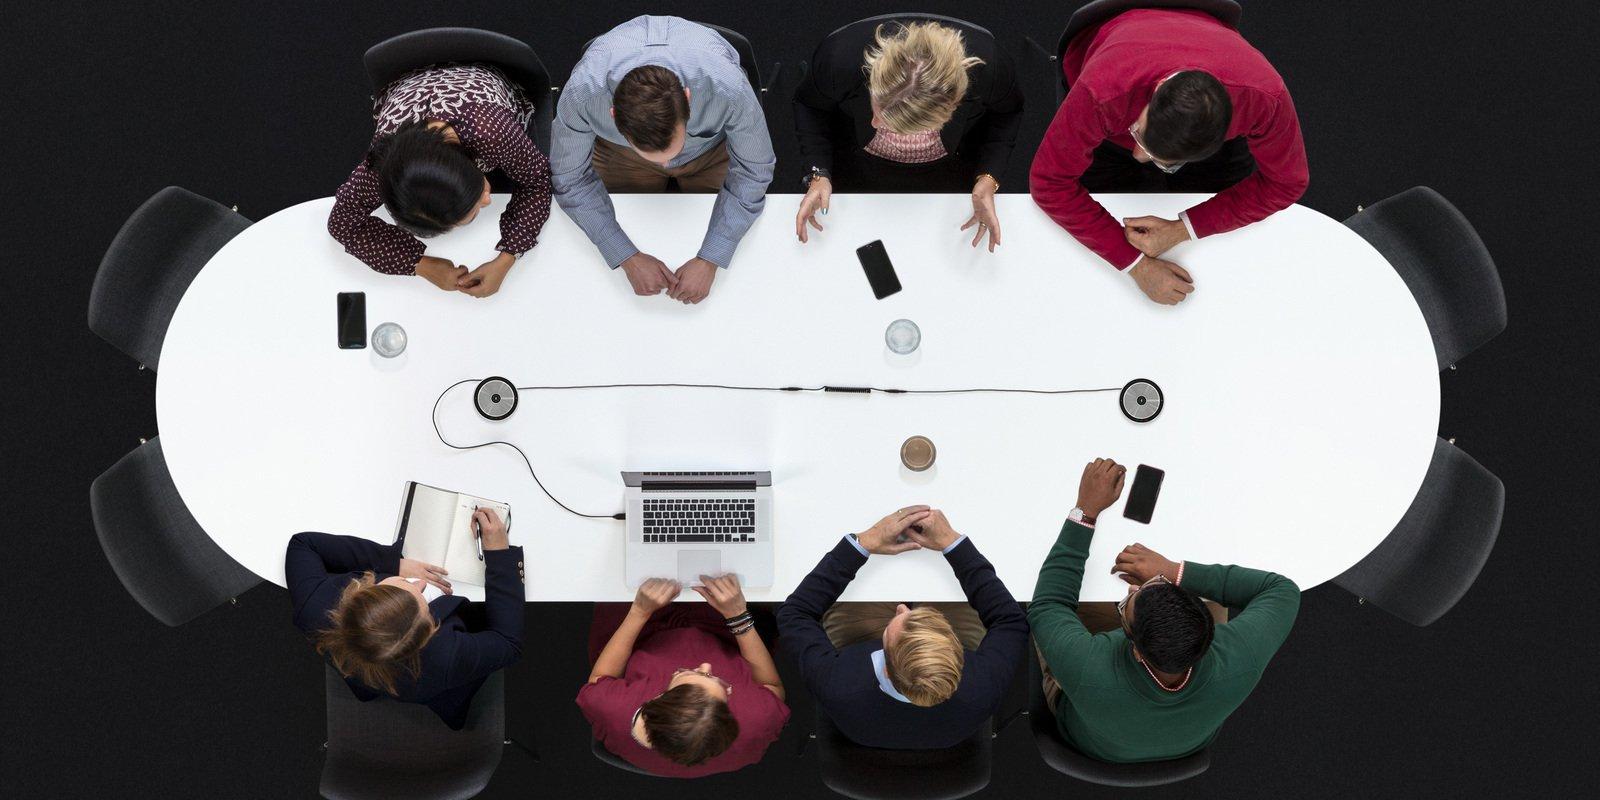 flexibility to collaborate